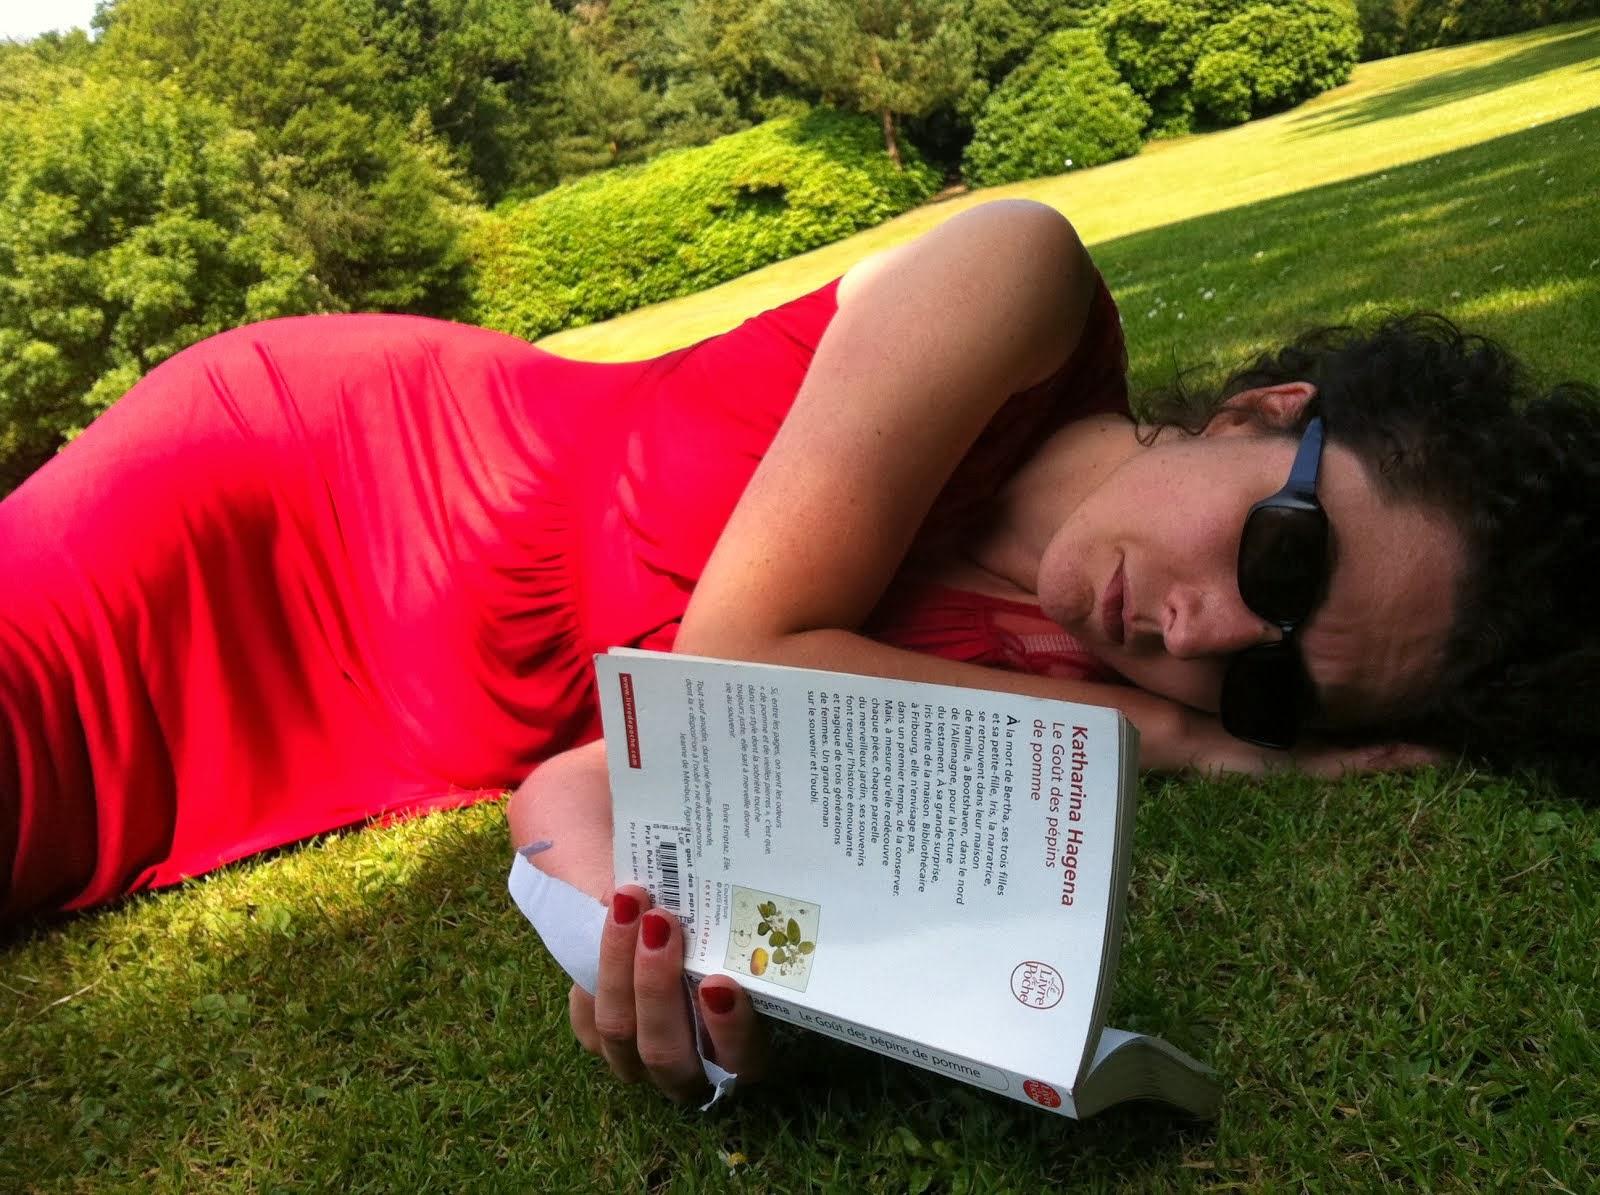 Elle lisant